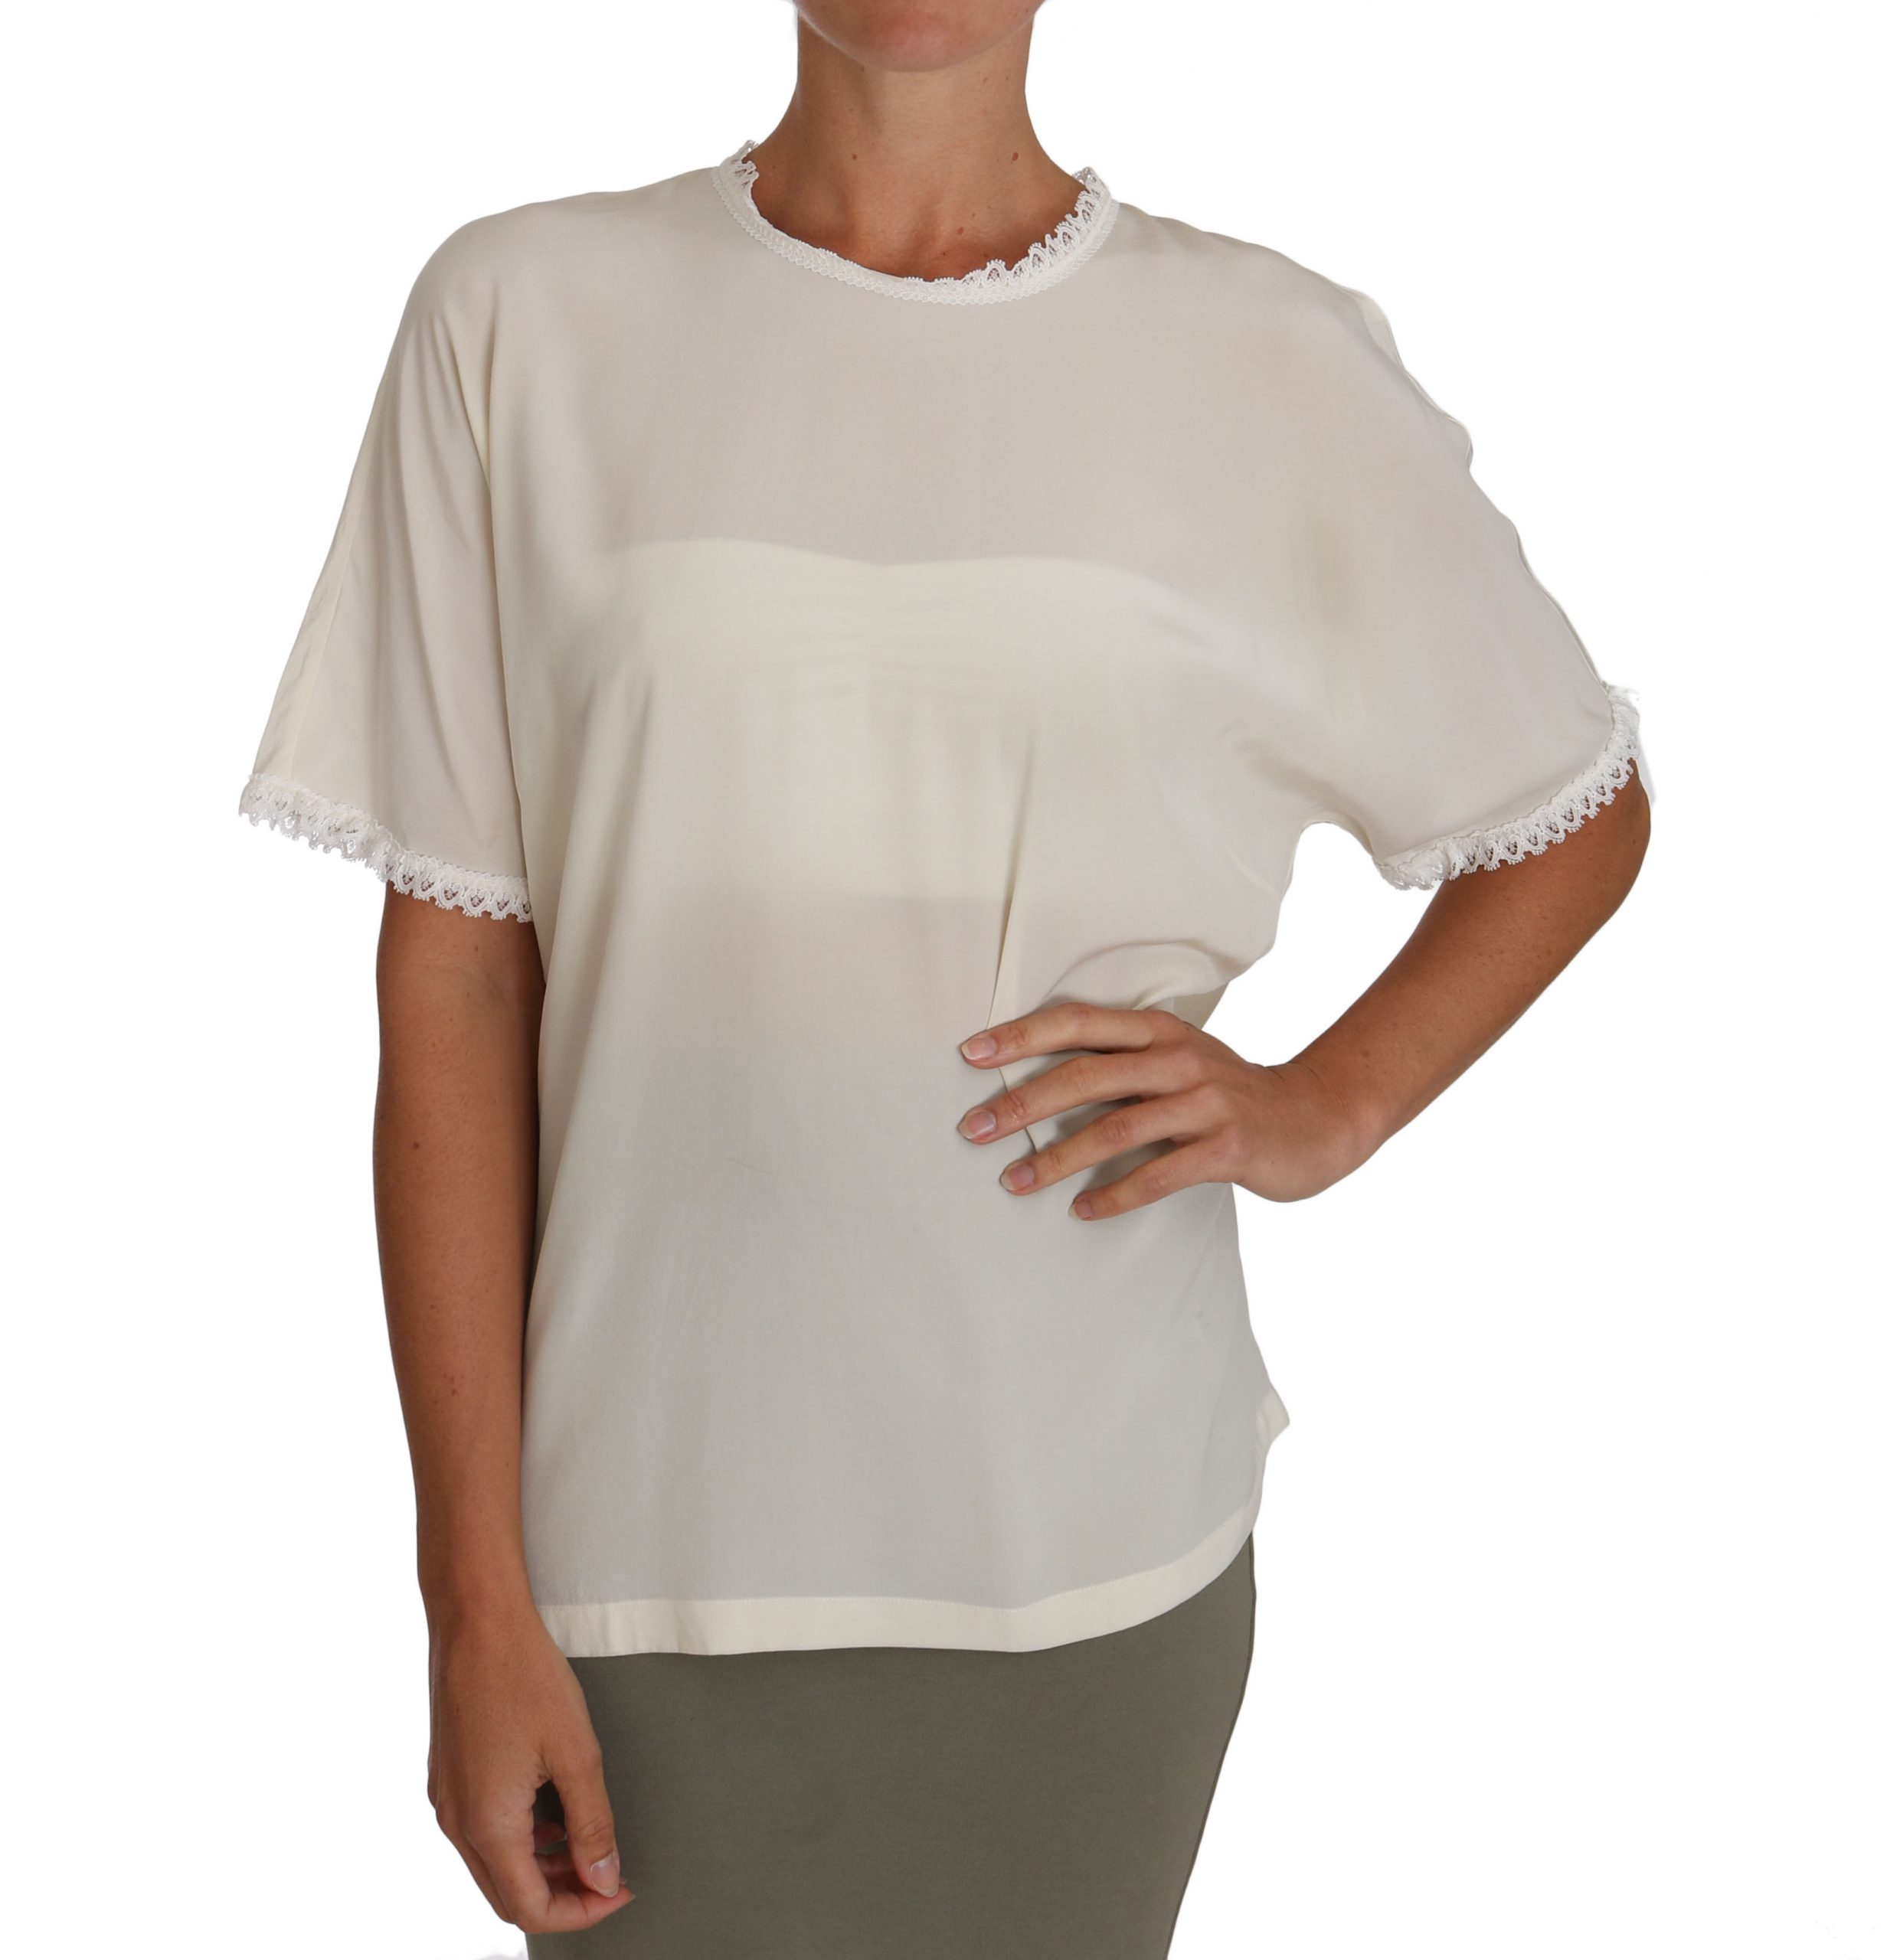 Dolce & Gabbana Women's Silk Lace Detailed Tops White TSH2687 - IT44|L